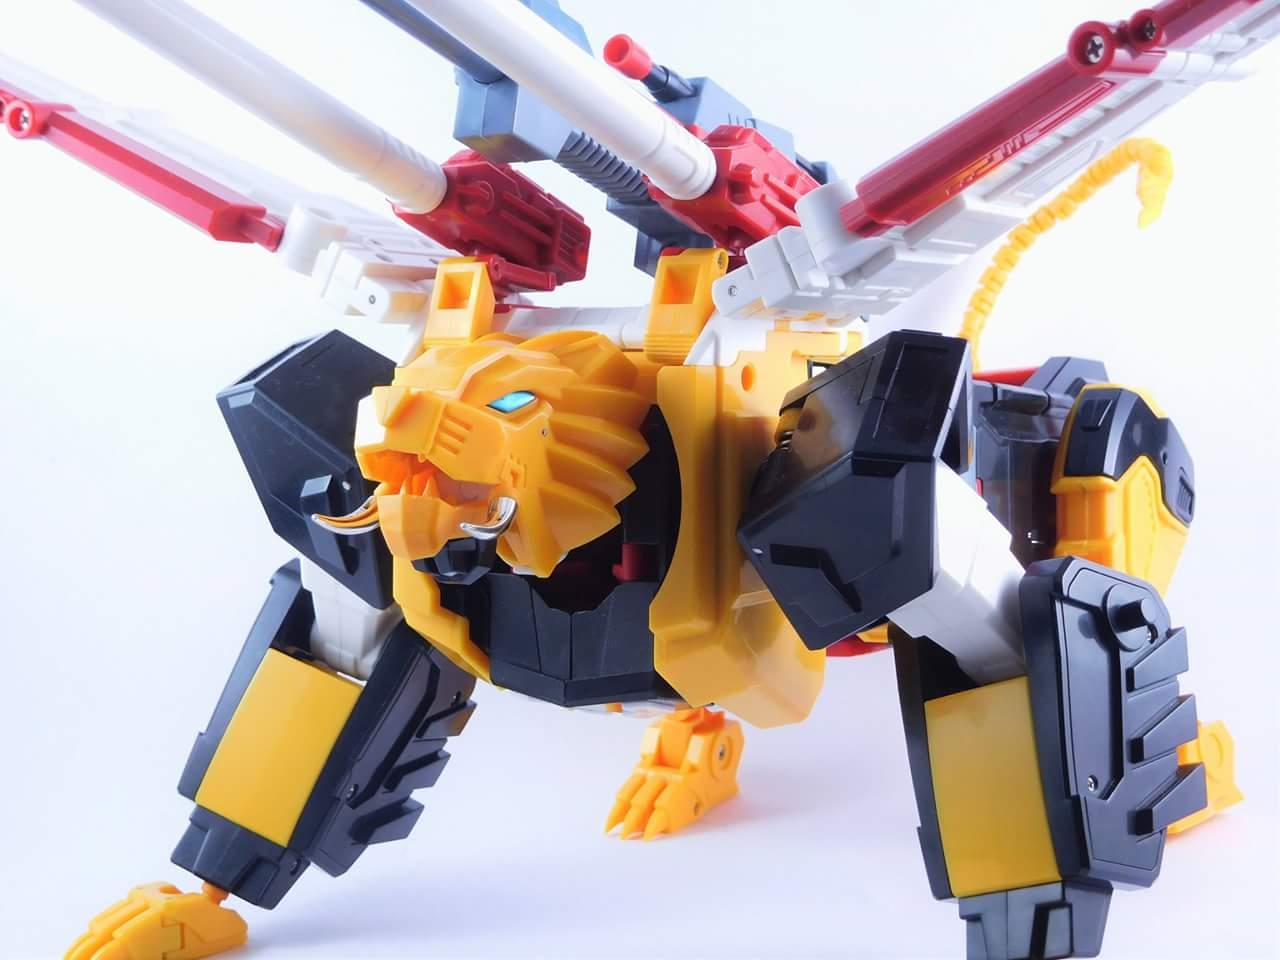 [KFC Toys] Produit Tiers - Jouet Phase 8-A Simba - aka Victory Leo (Transformers Victory) - Page 2 KfyTz4oK